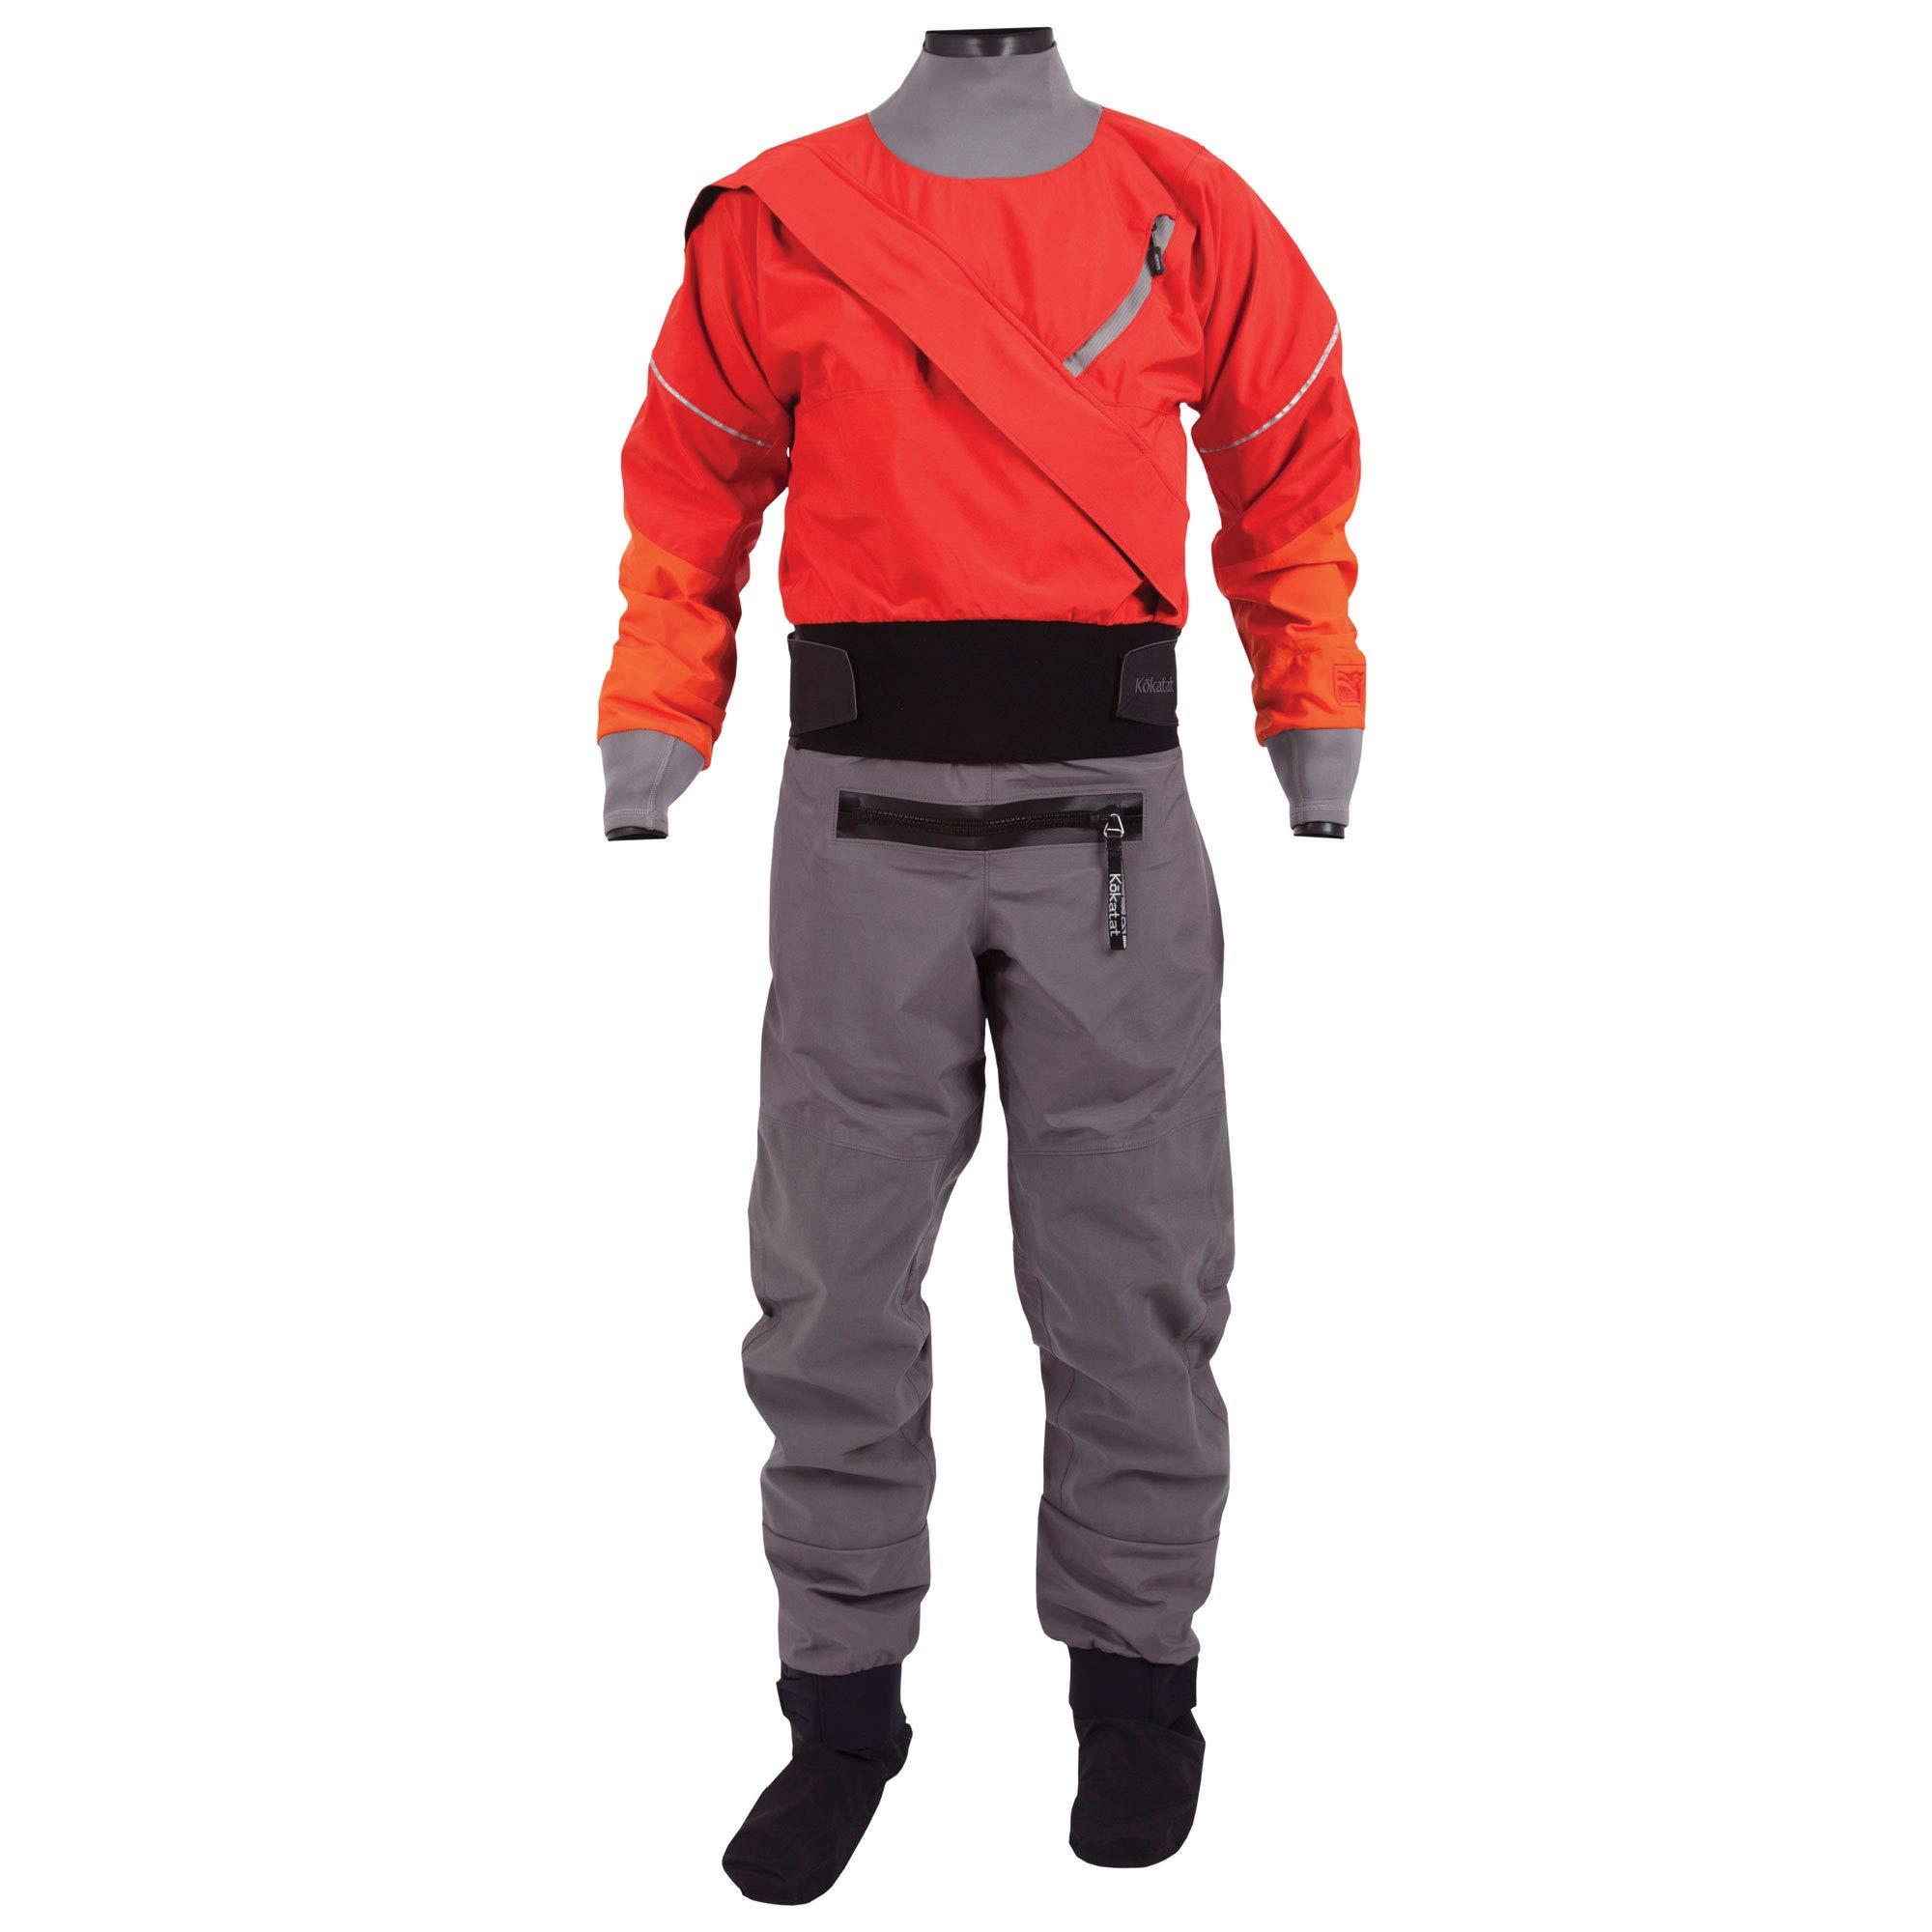 Kokatat Men's Gore-Tex Meridian Drysuit-Red-M by Kokatat